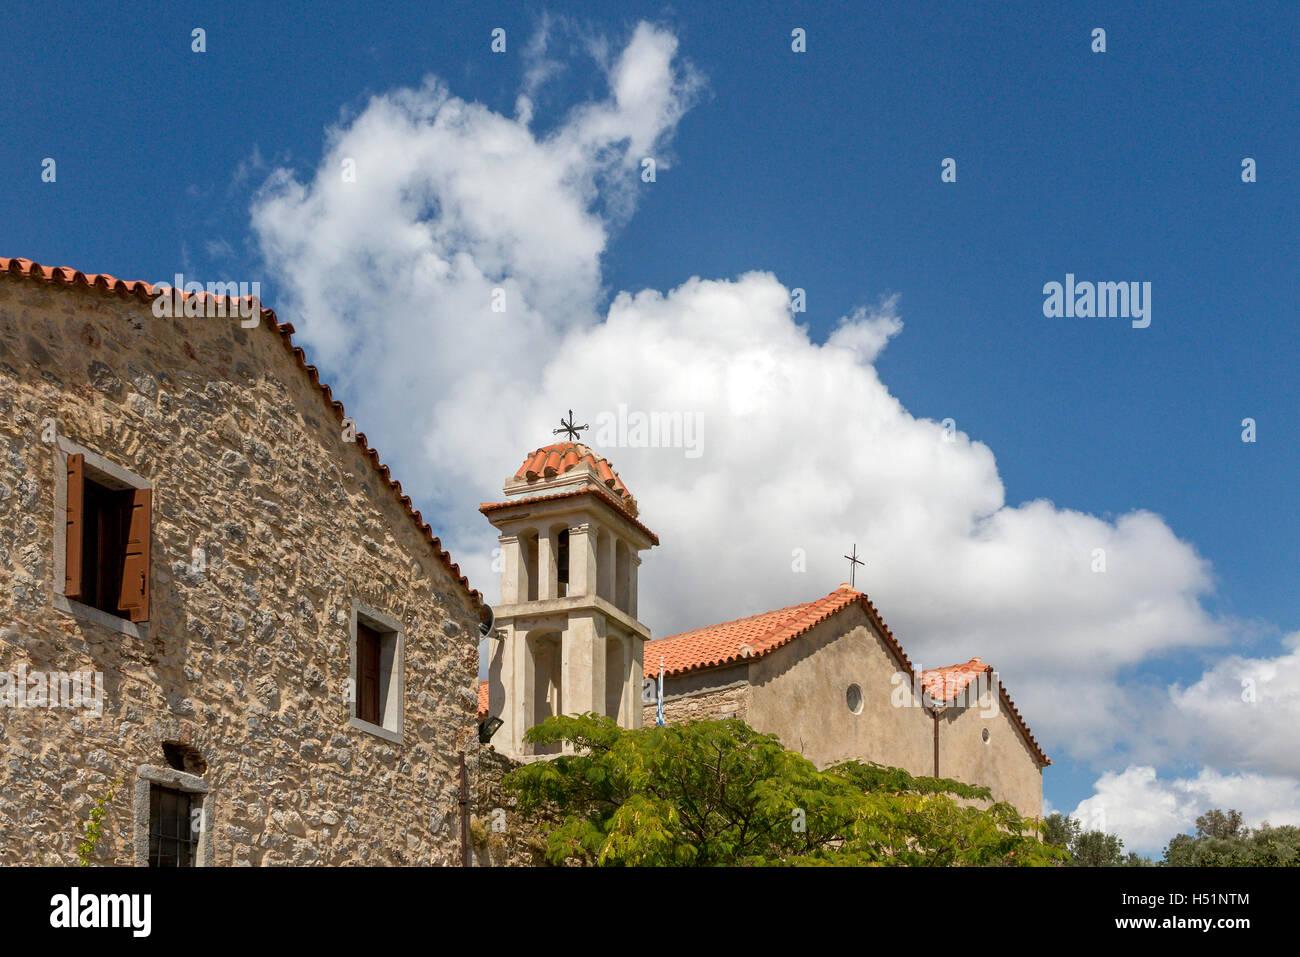 Archangel church at Anavatos mountain village  Chios Greece - Stock Image